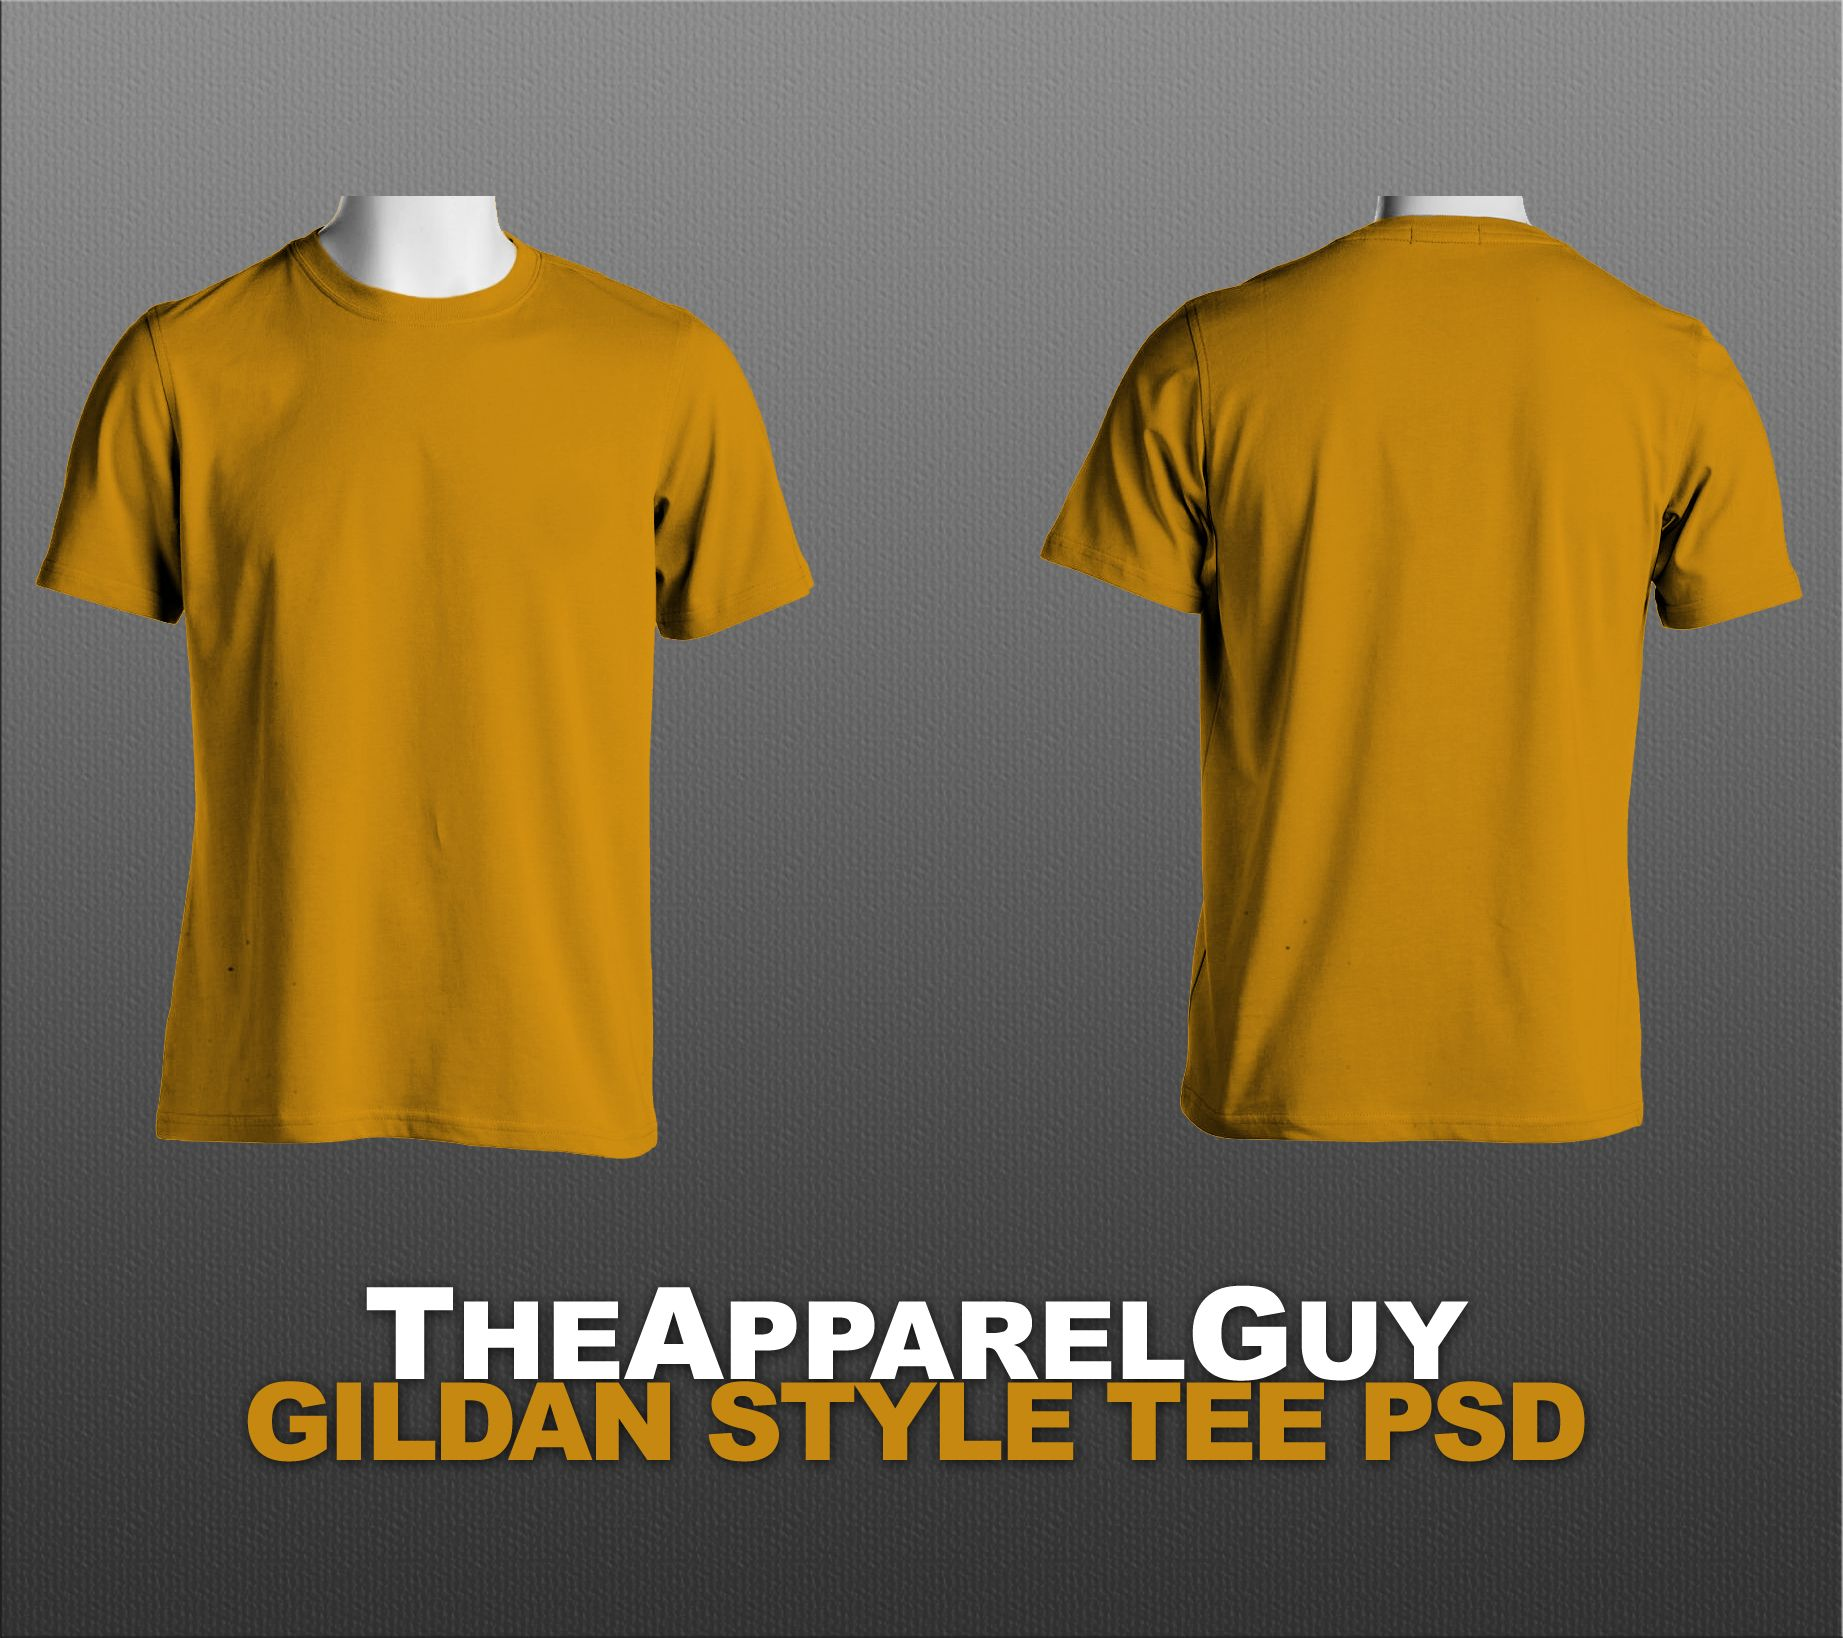 Gildan Style Tee Template Psd By Theapparelguyiantart On